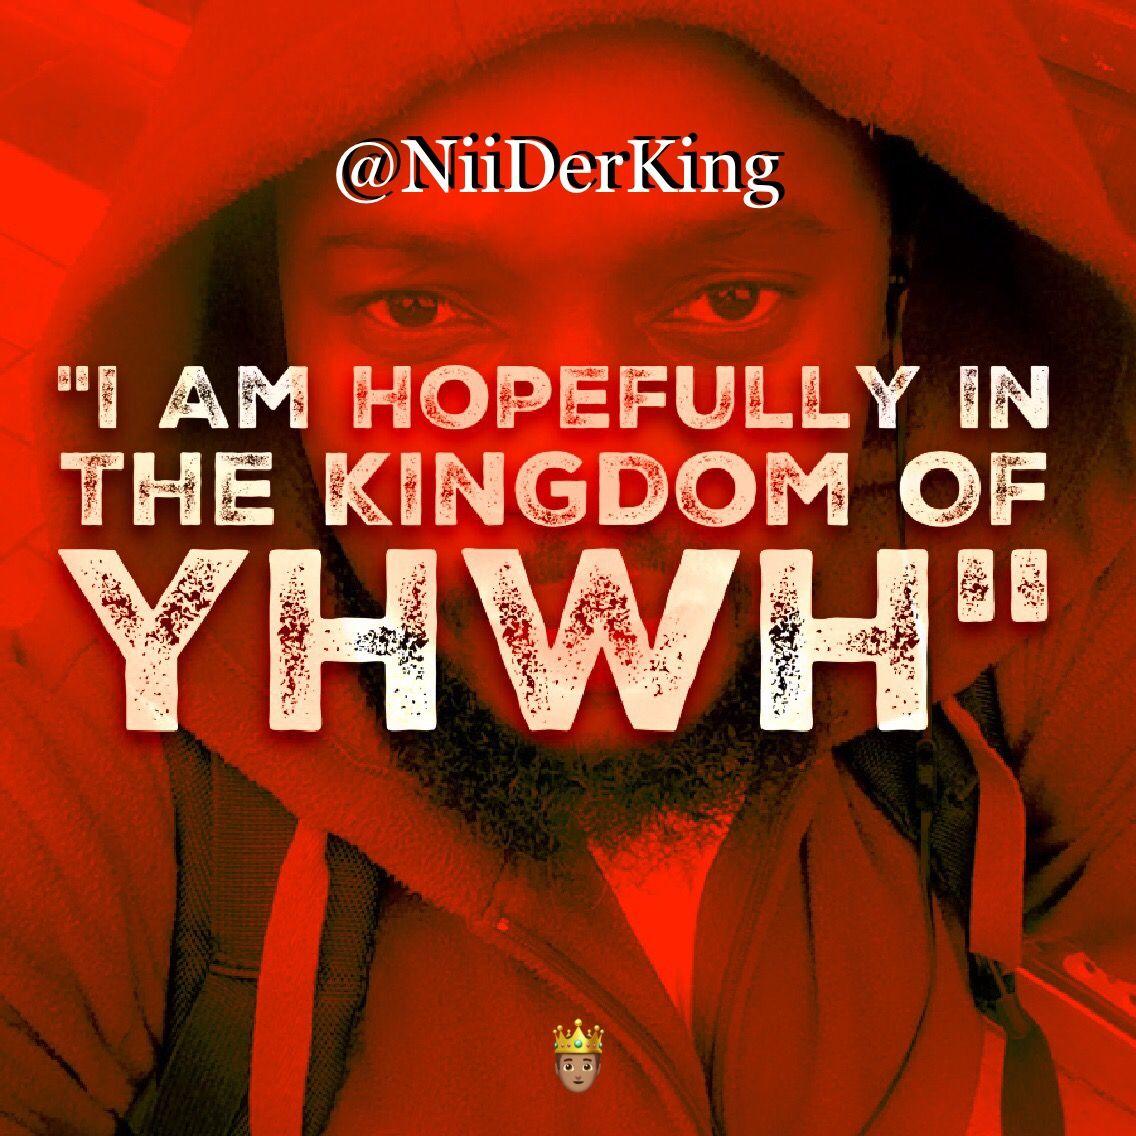 #Hopeful #Hope #Kingdom